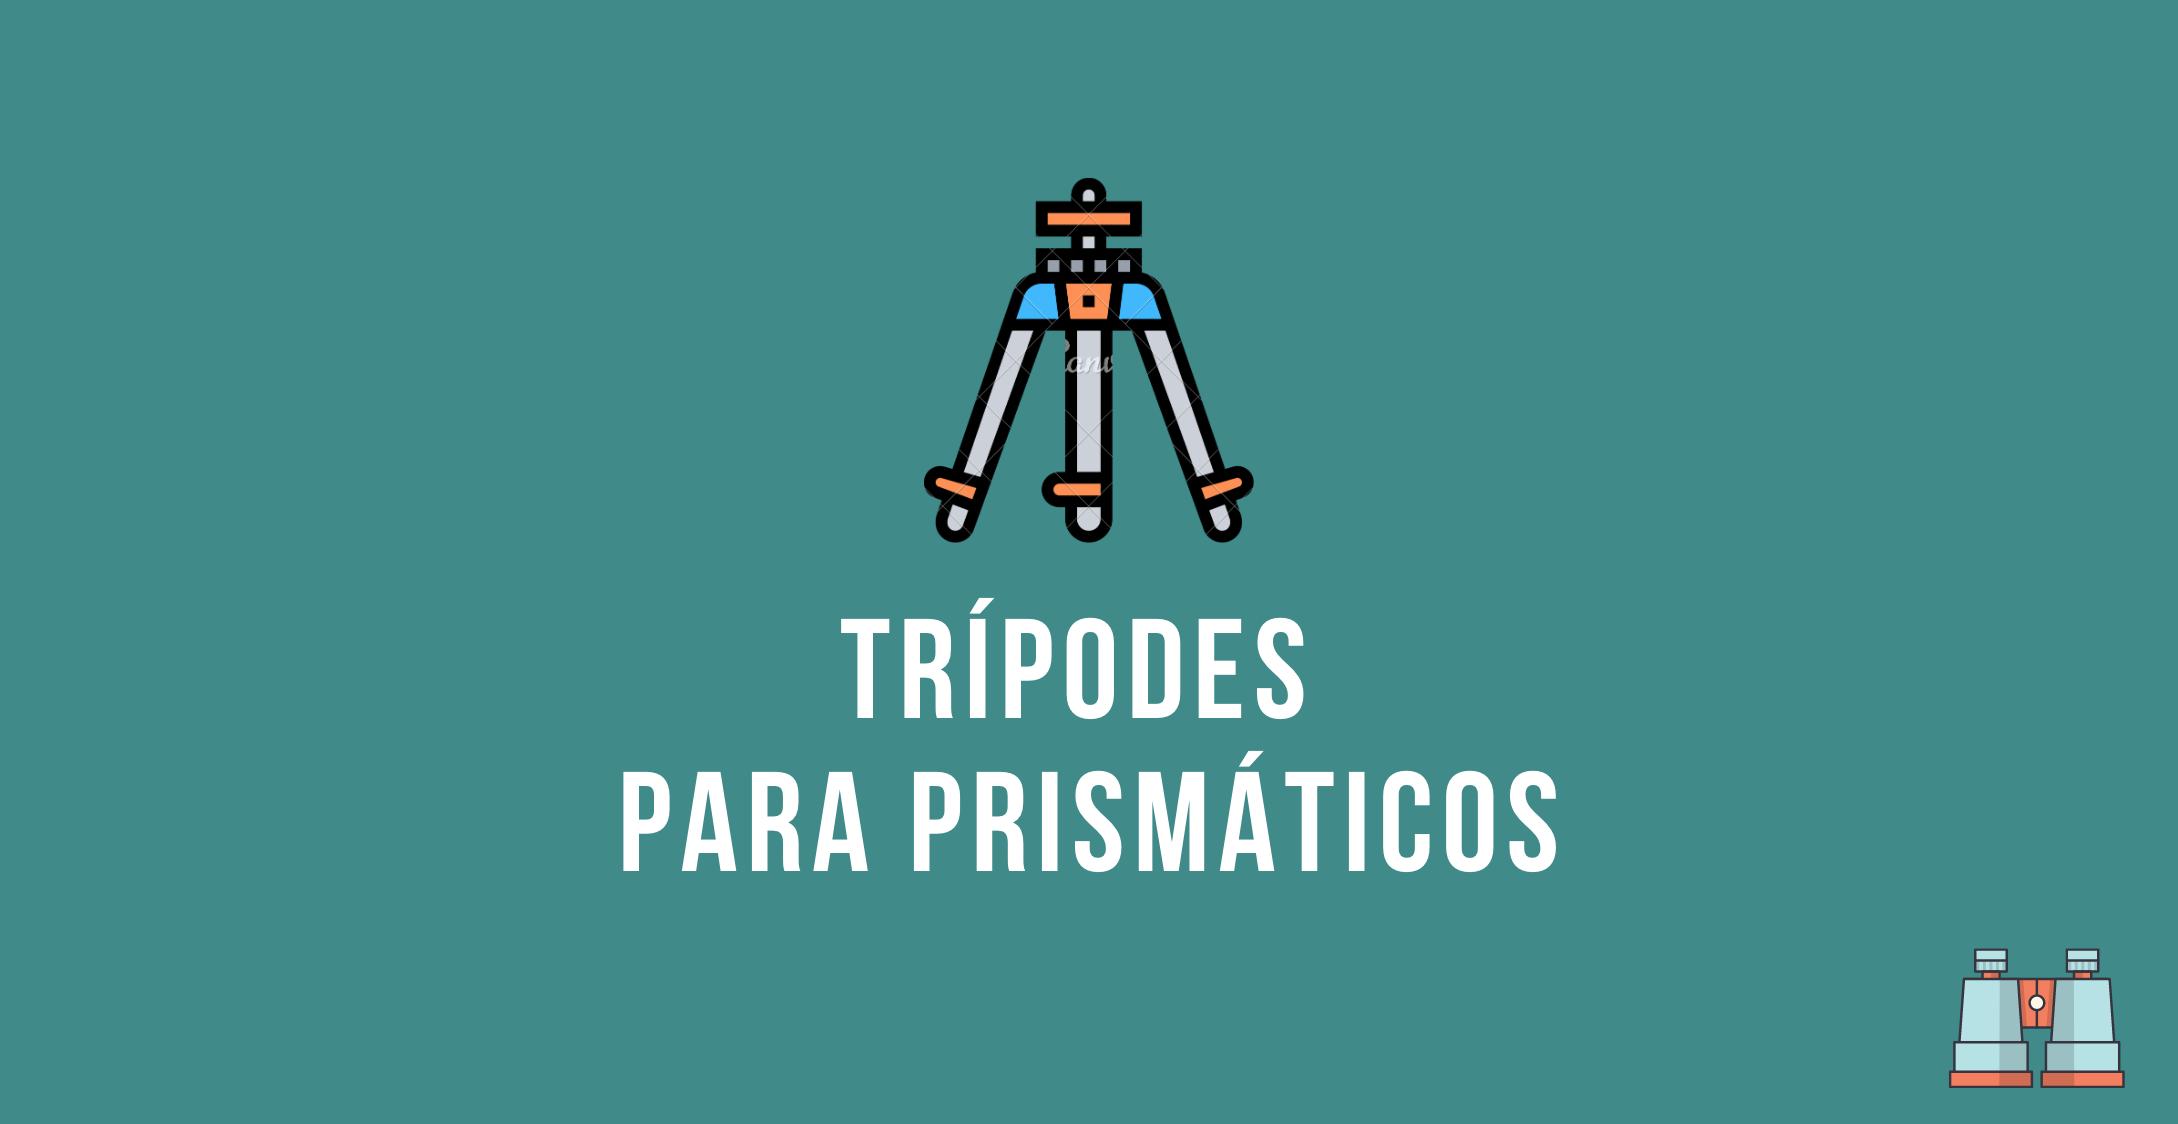 guia de accesorios para prismaticos